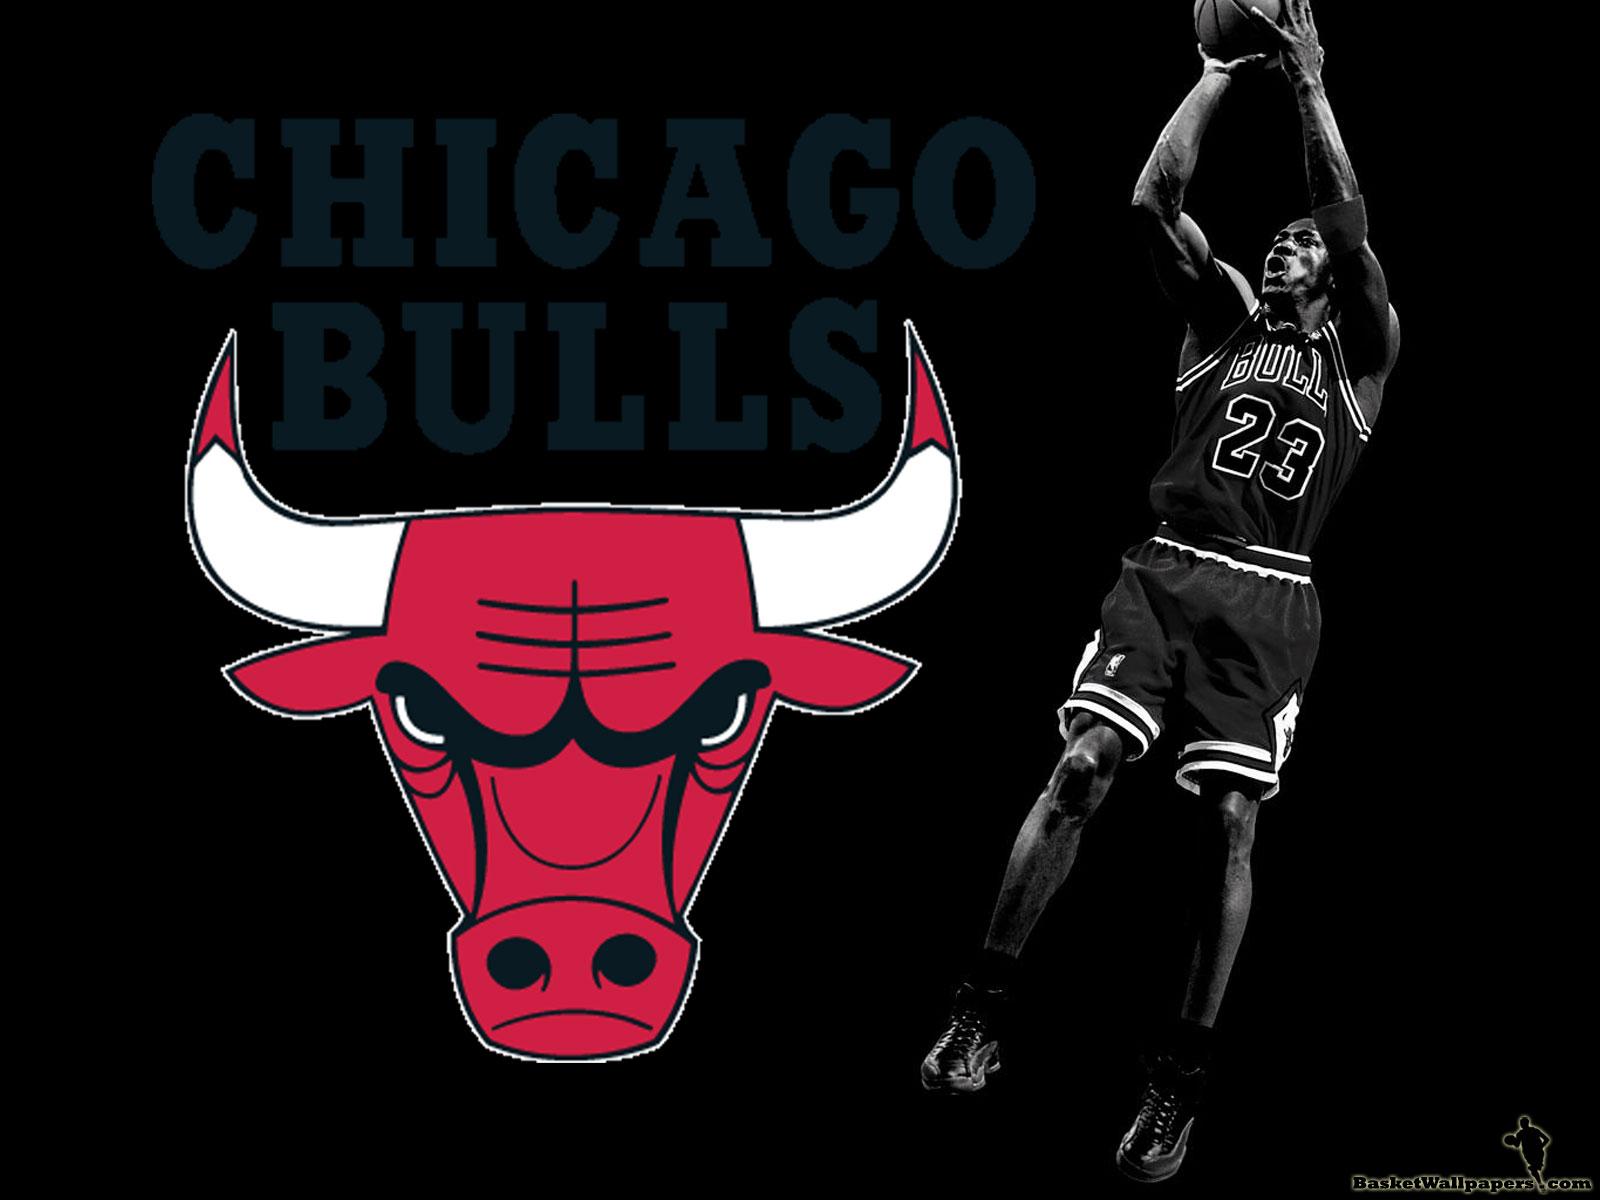 http://1.bp.blogspot.com/_FUqunw1CcGY/TQ5N-t_ywVI/AAAAAAAAAfE/FldaQJOSCQo/s1600/Michael-Jordan-Chicago-Bulls-Wallpaper.jpg